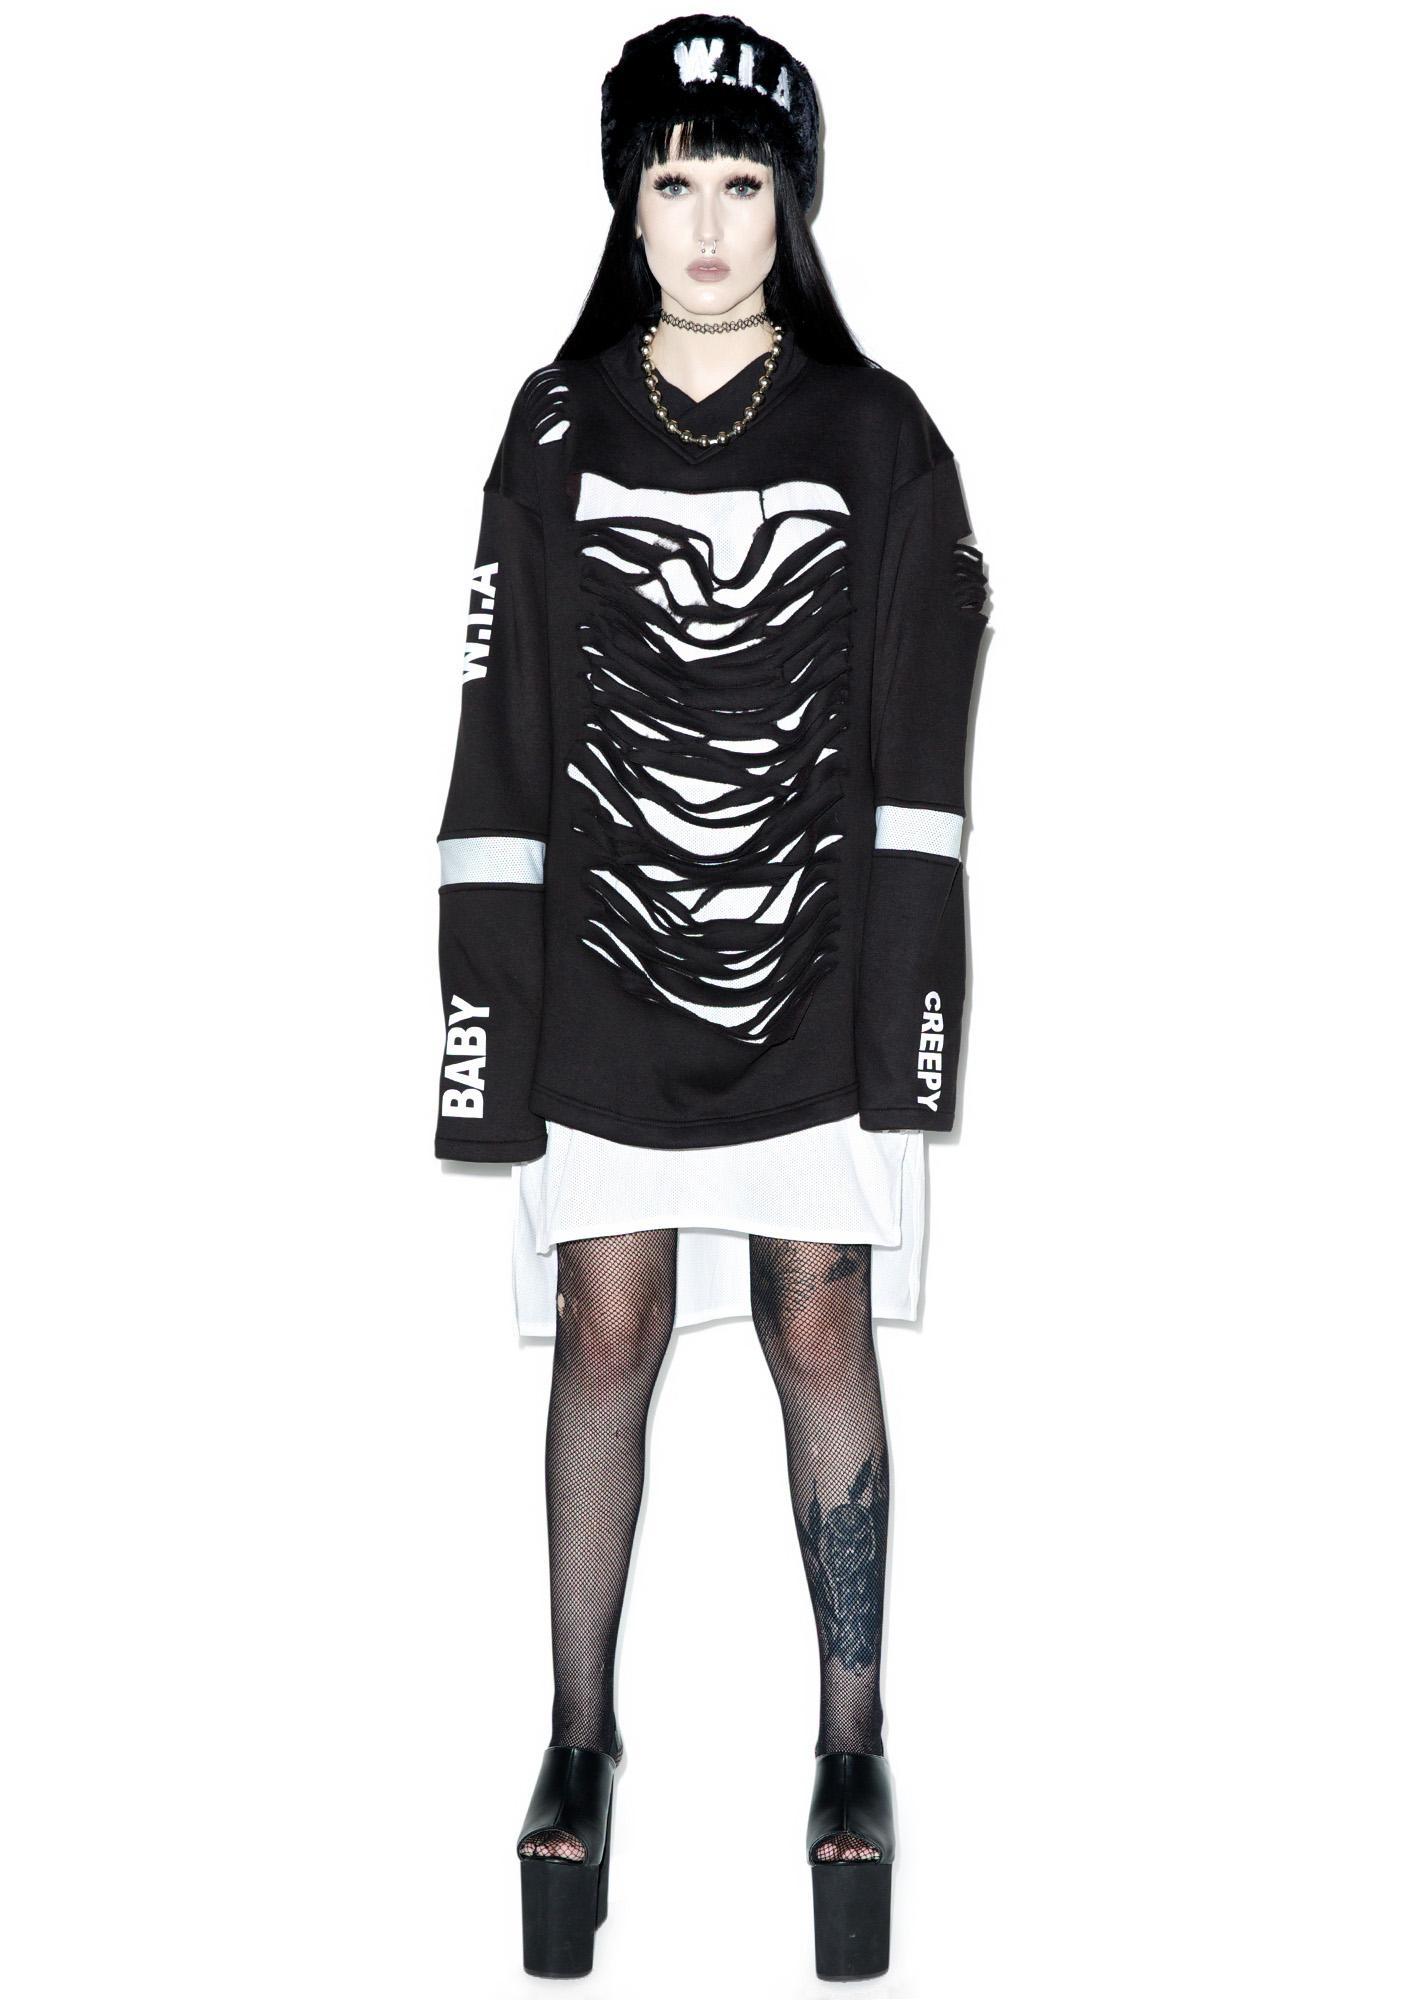 W.I.A X Dolls Kill Destroyed Sweater